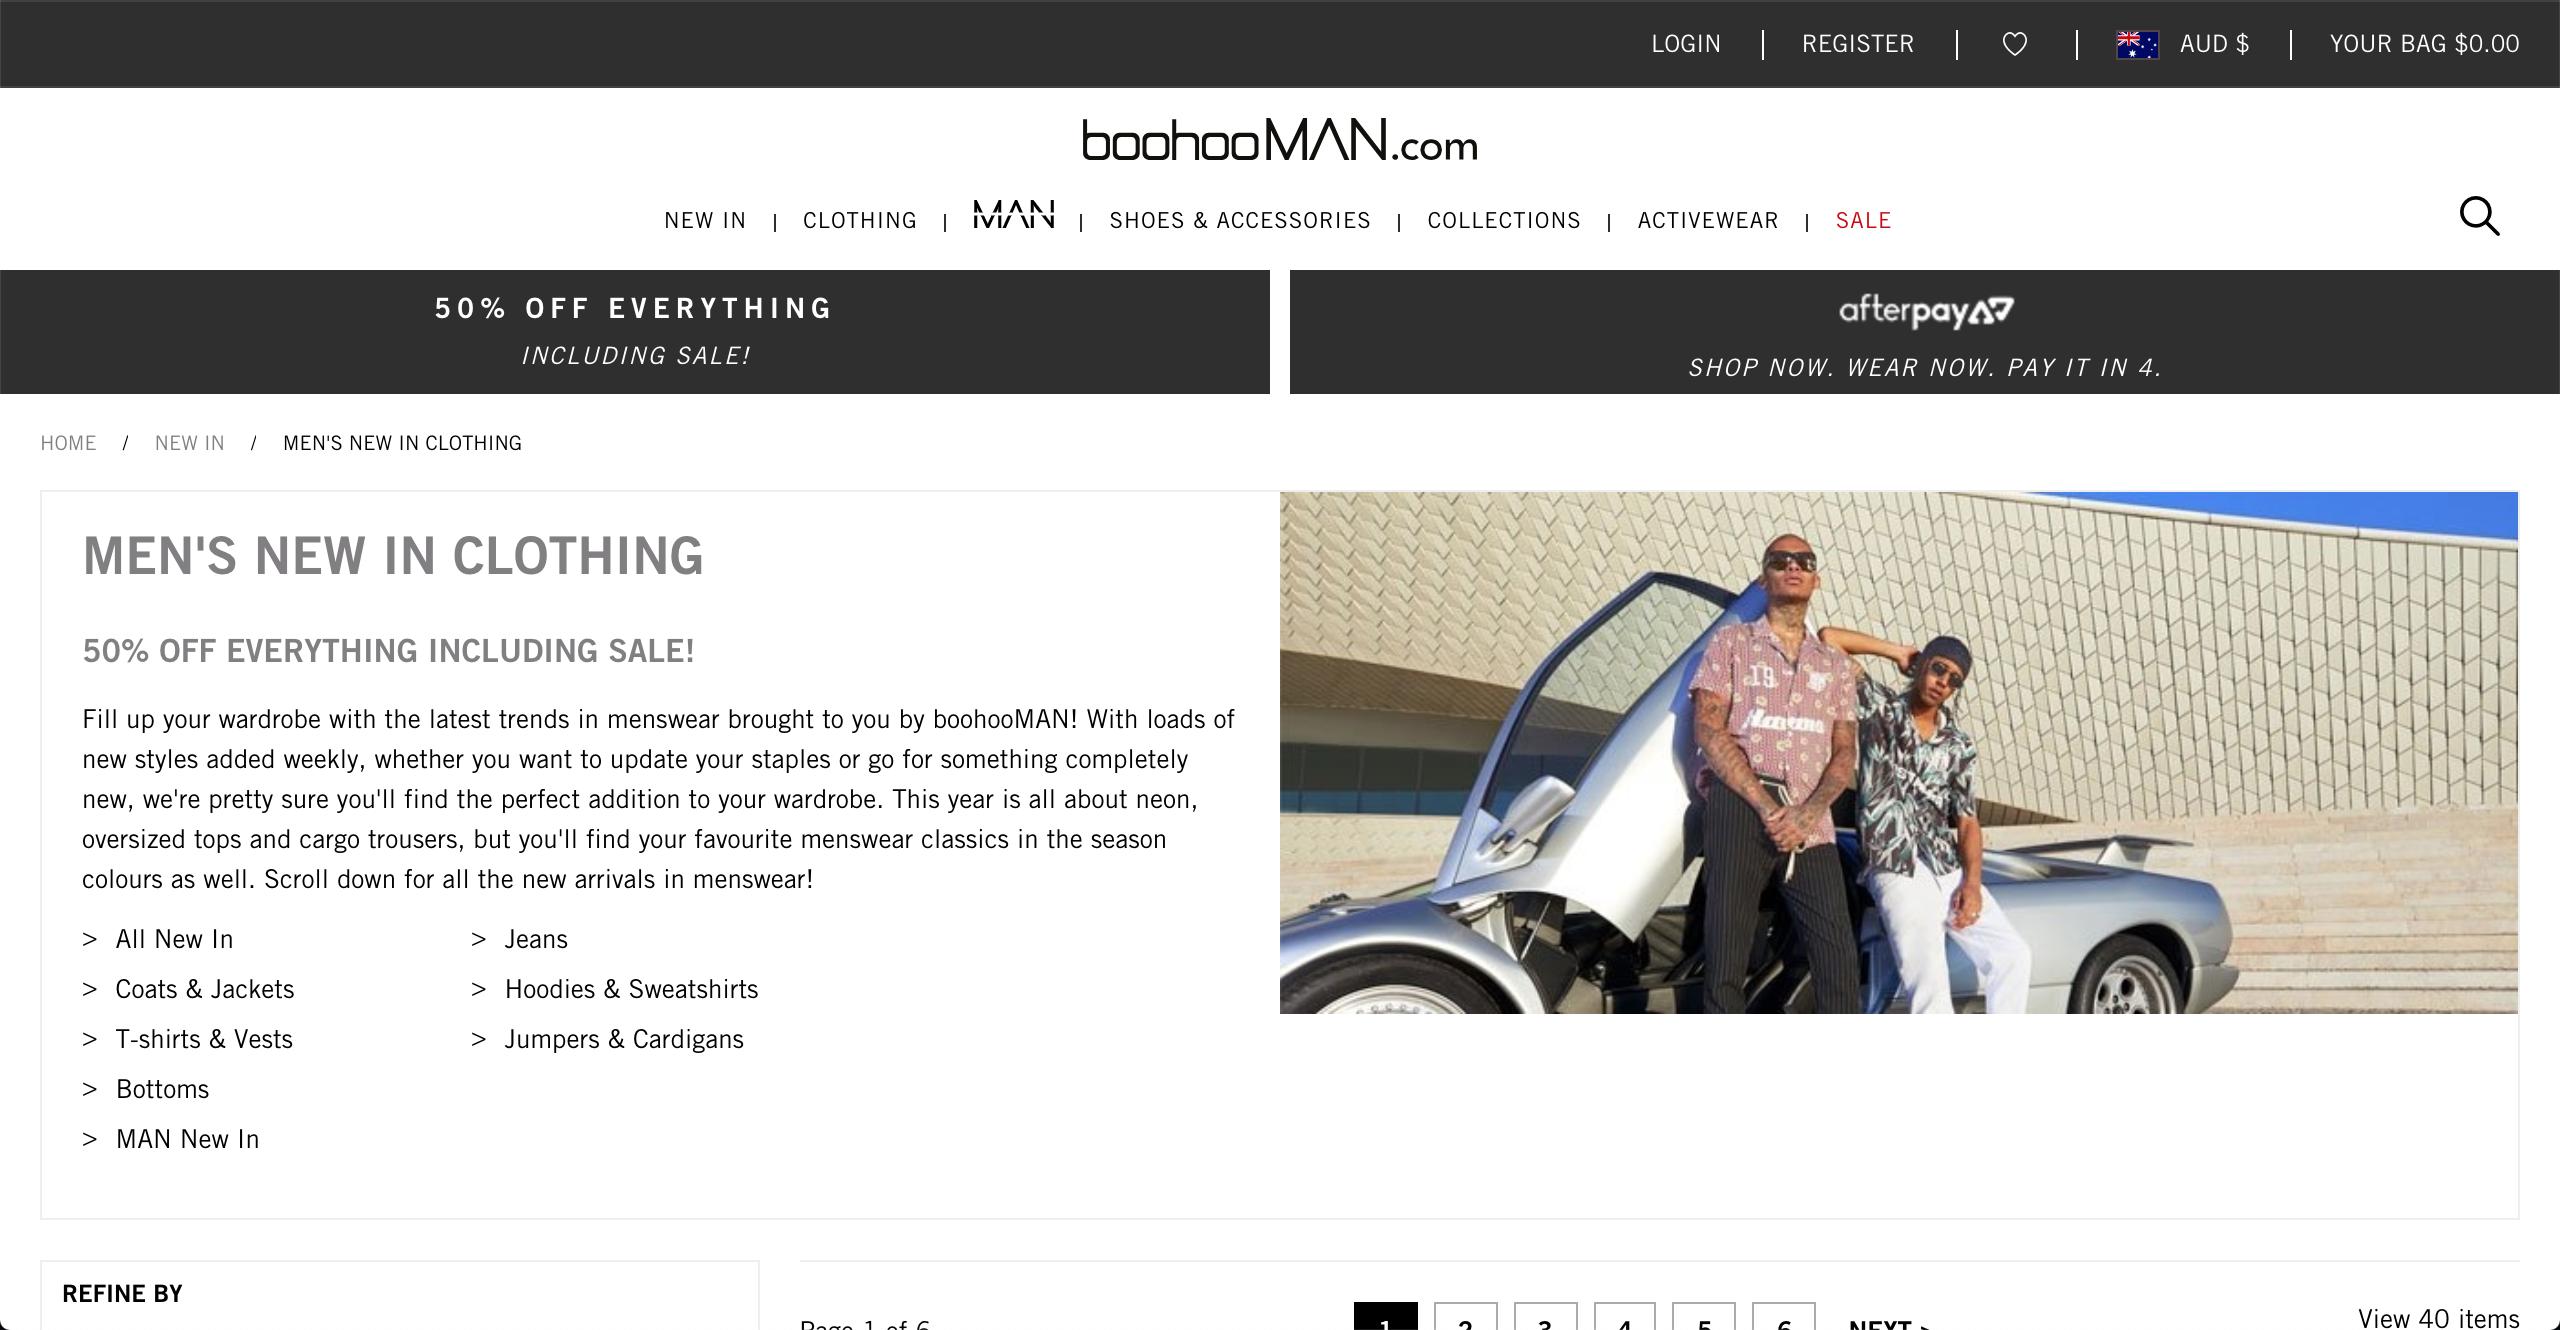 boohooMAN clothing page